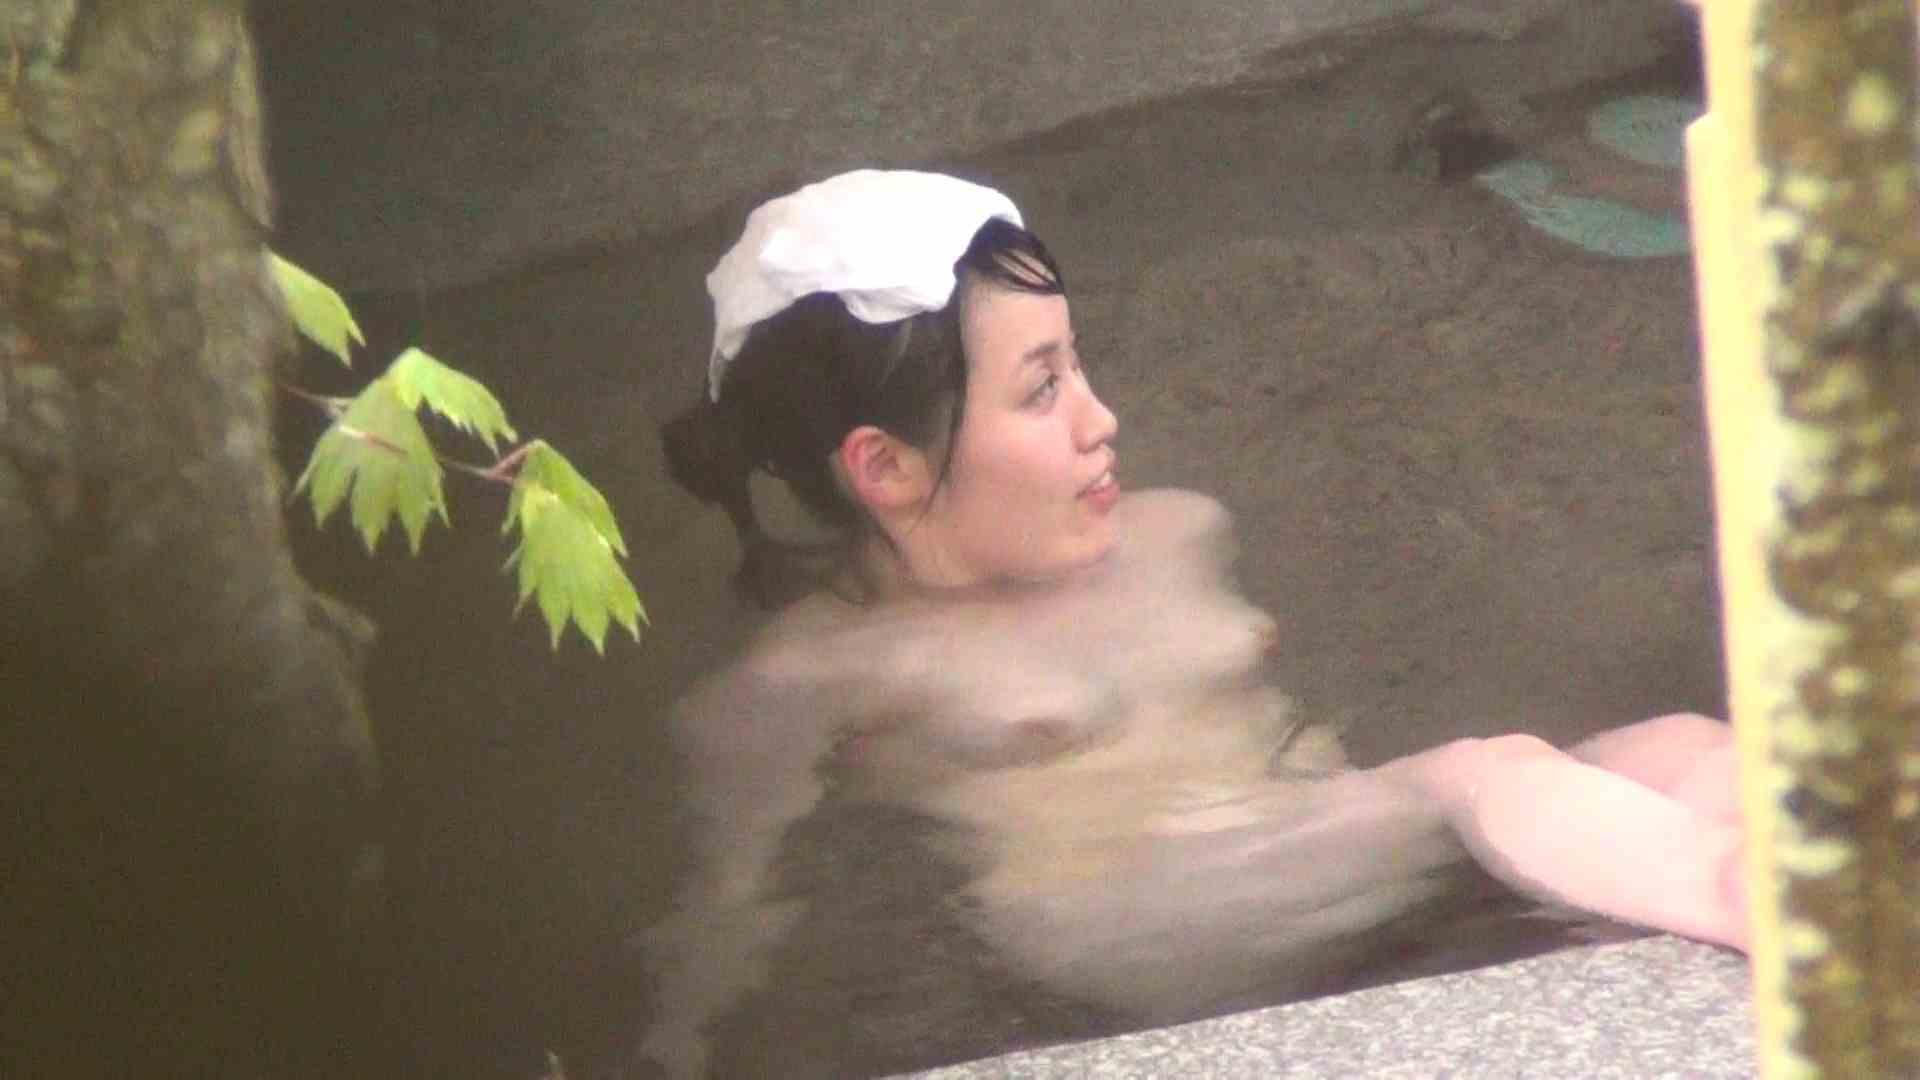 Aquaな露天風呂Vol.235 露天   盗撮特撮  10pic 10